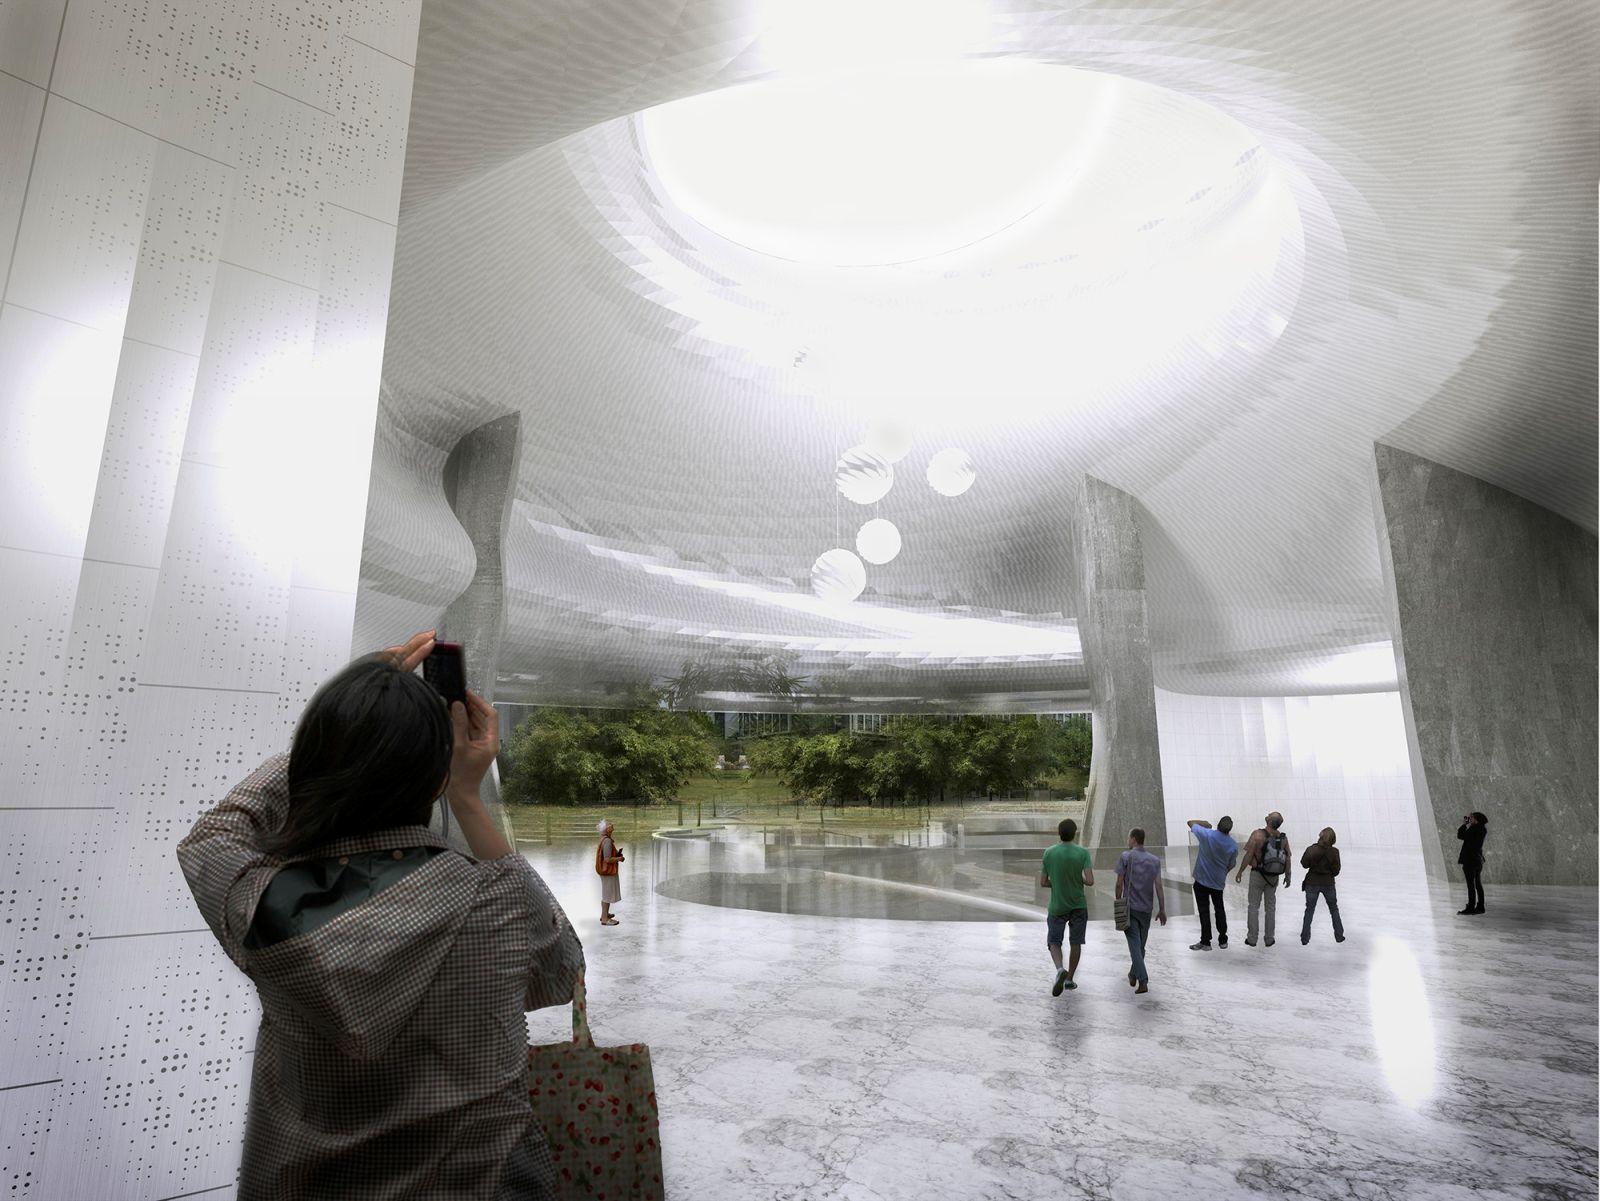 Bao'an Public Cultural and Art Center